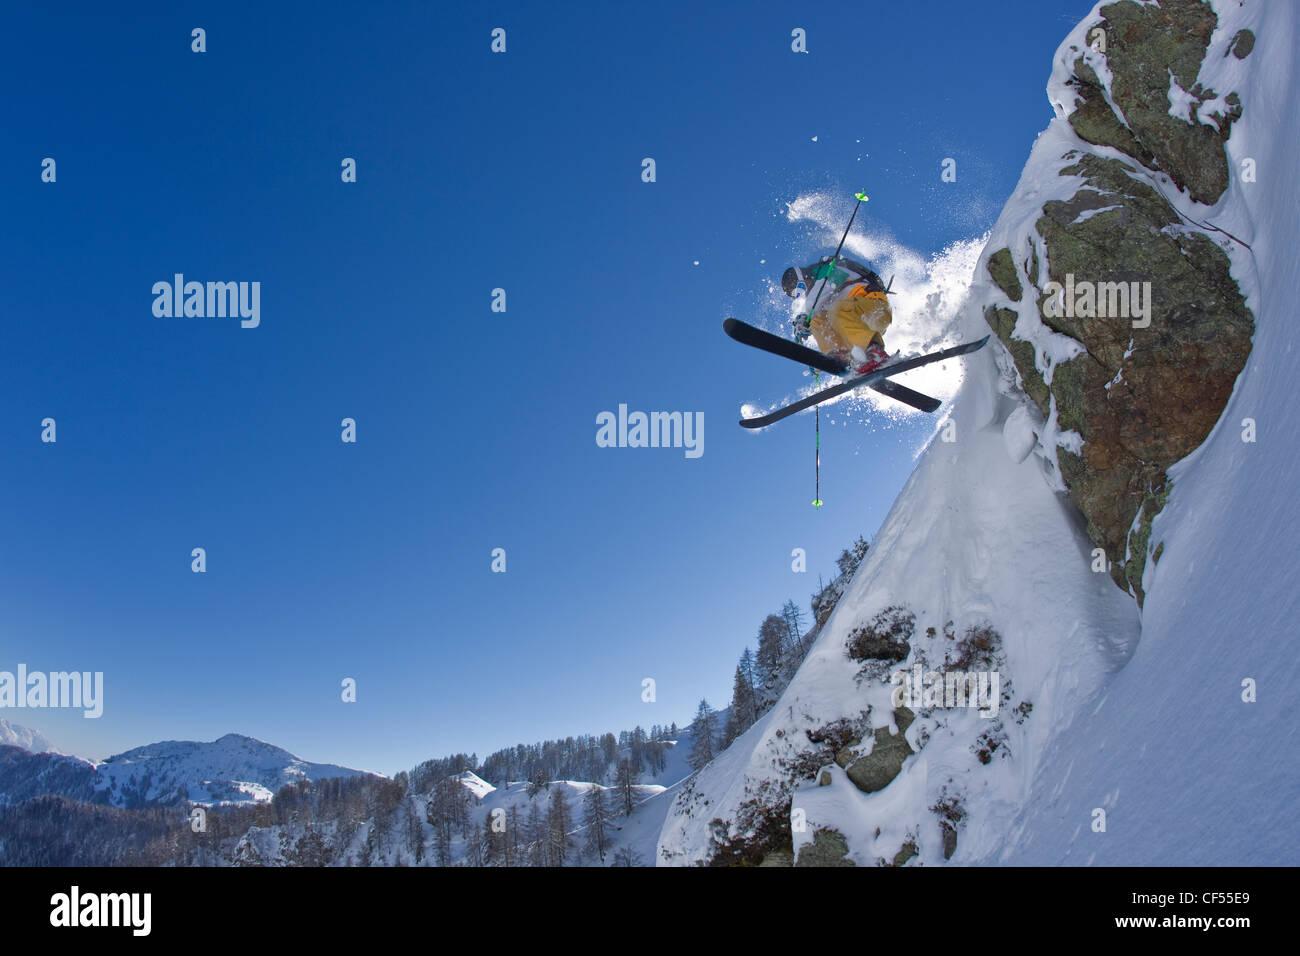 Austria, Tyrol, Kitzbuehel, Mature man doing freestyle skiing - Stock Image